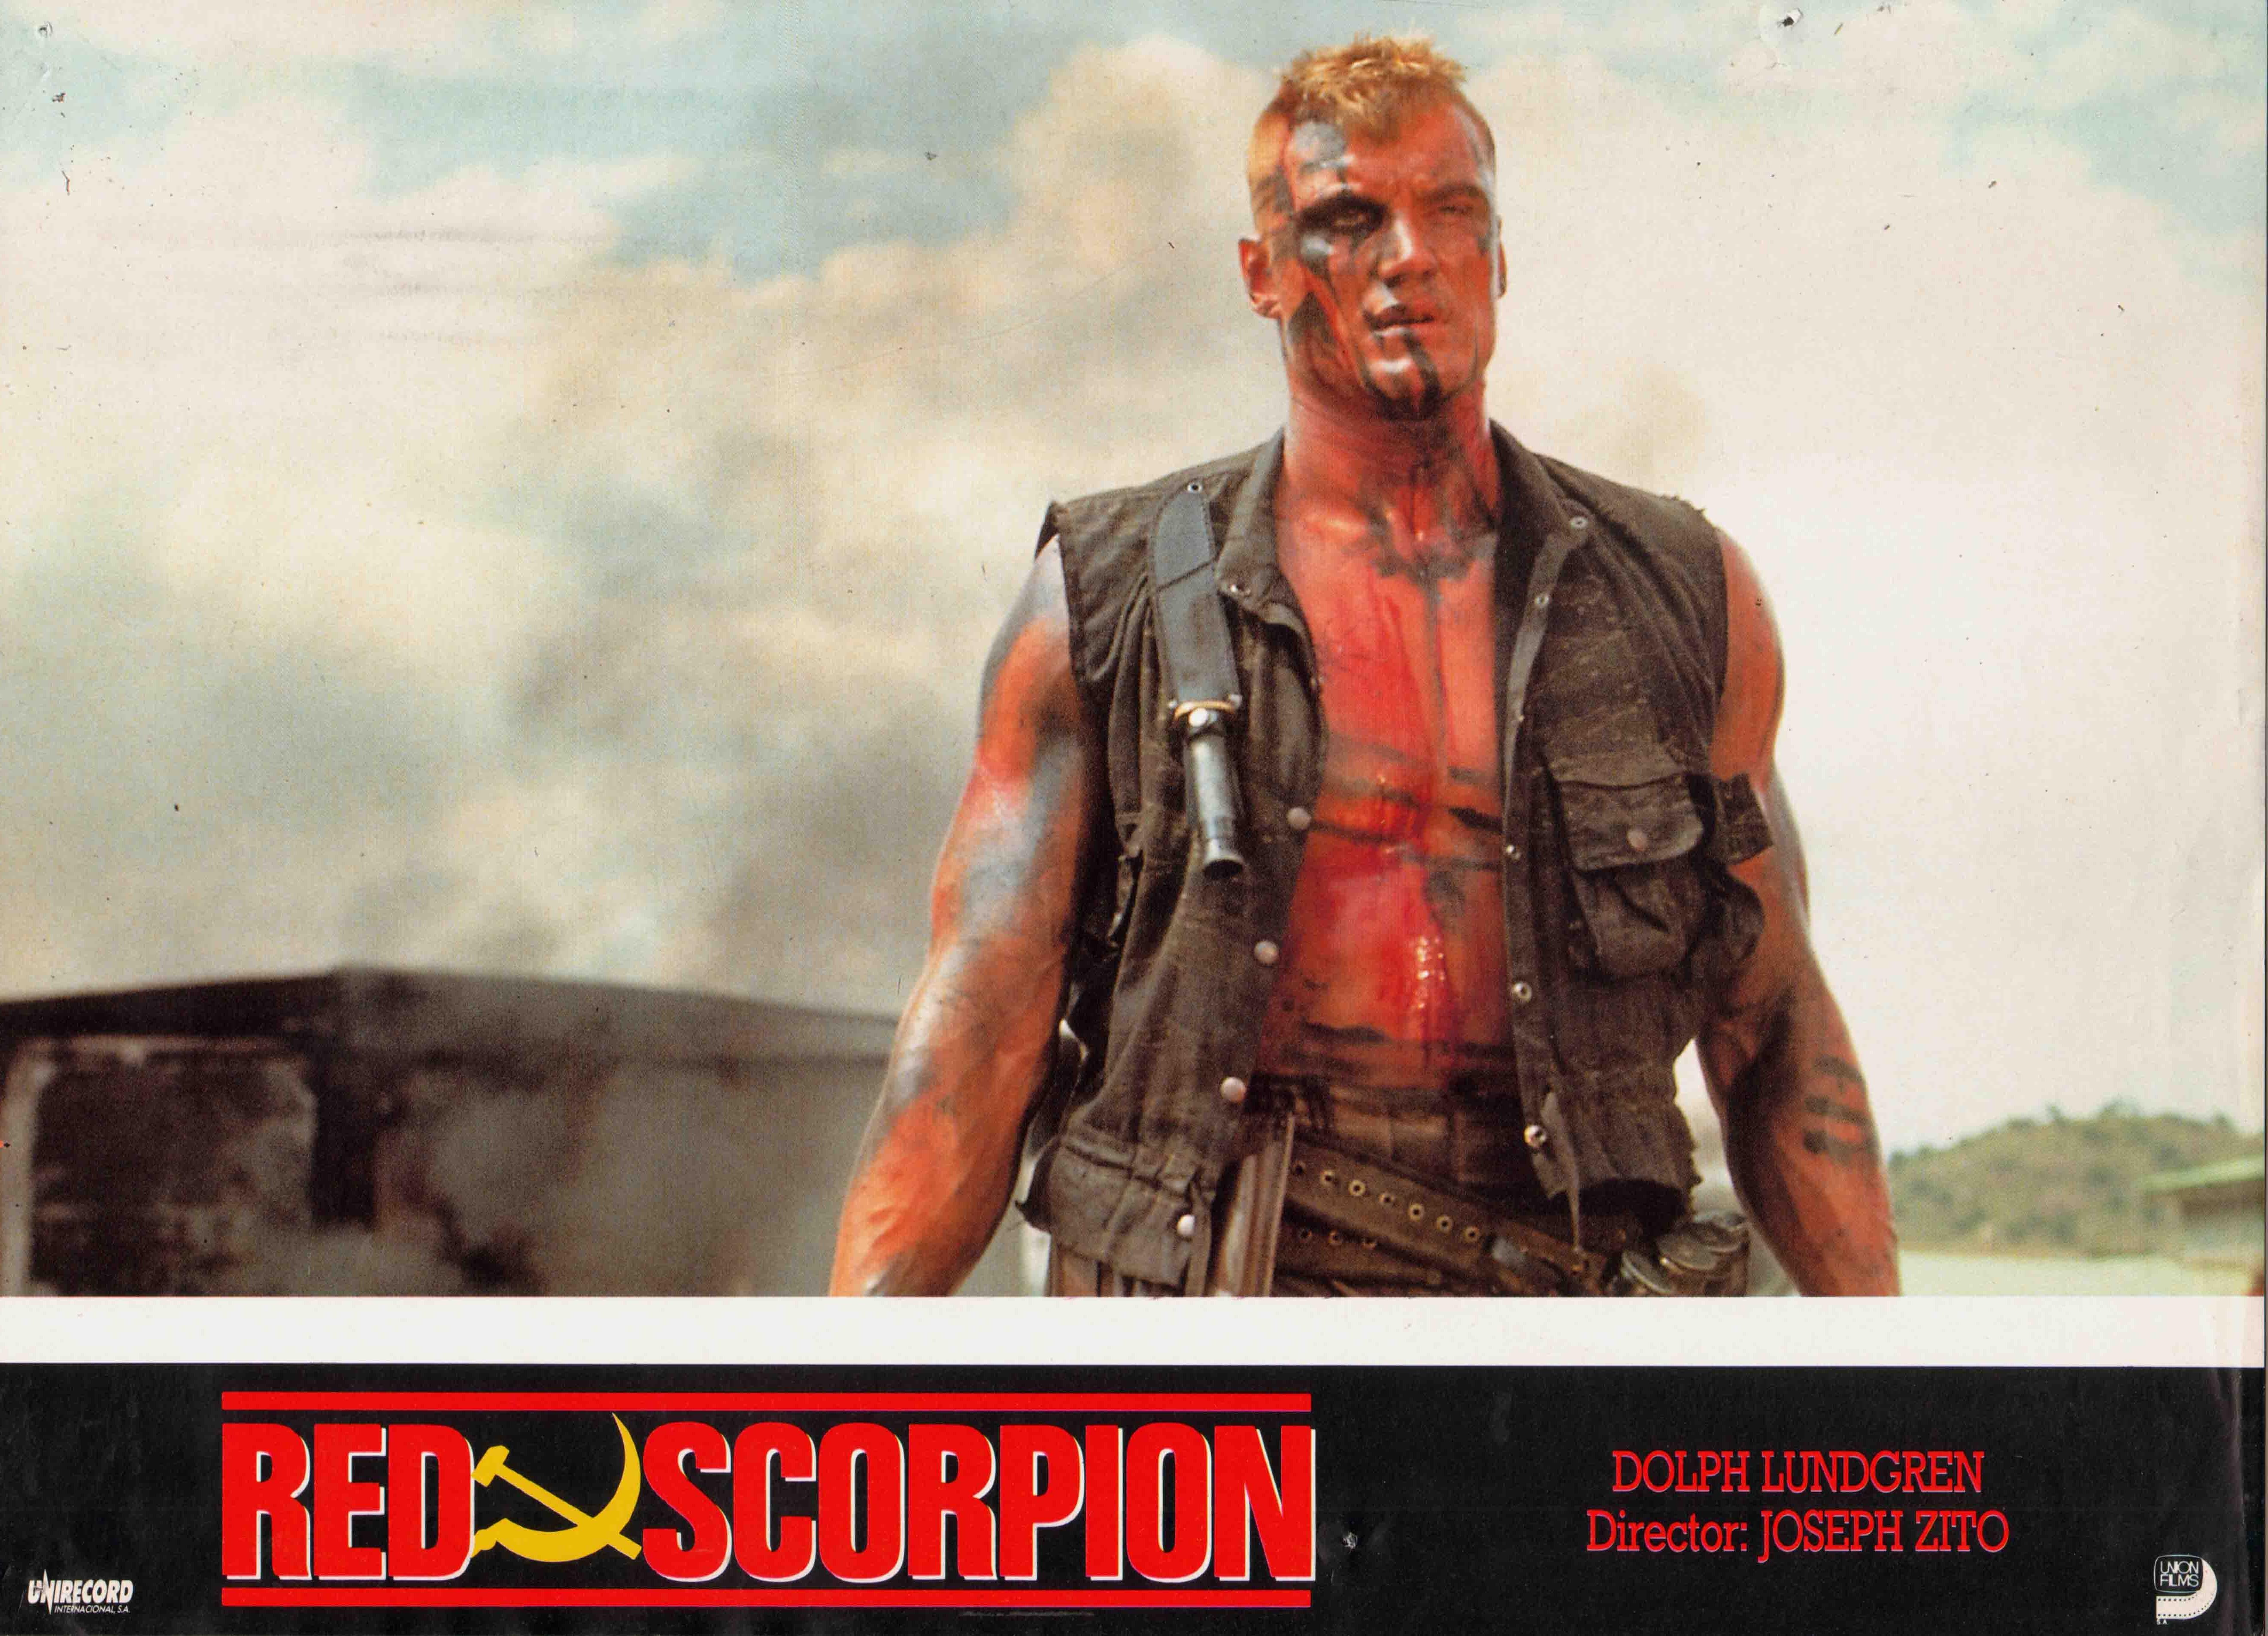 LUNDGREN FILME RED BAIXAR DOLPH SCORPION